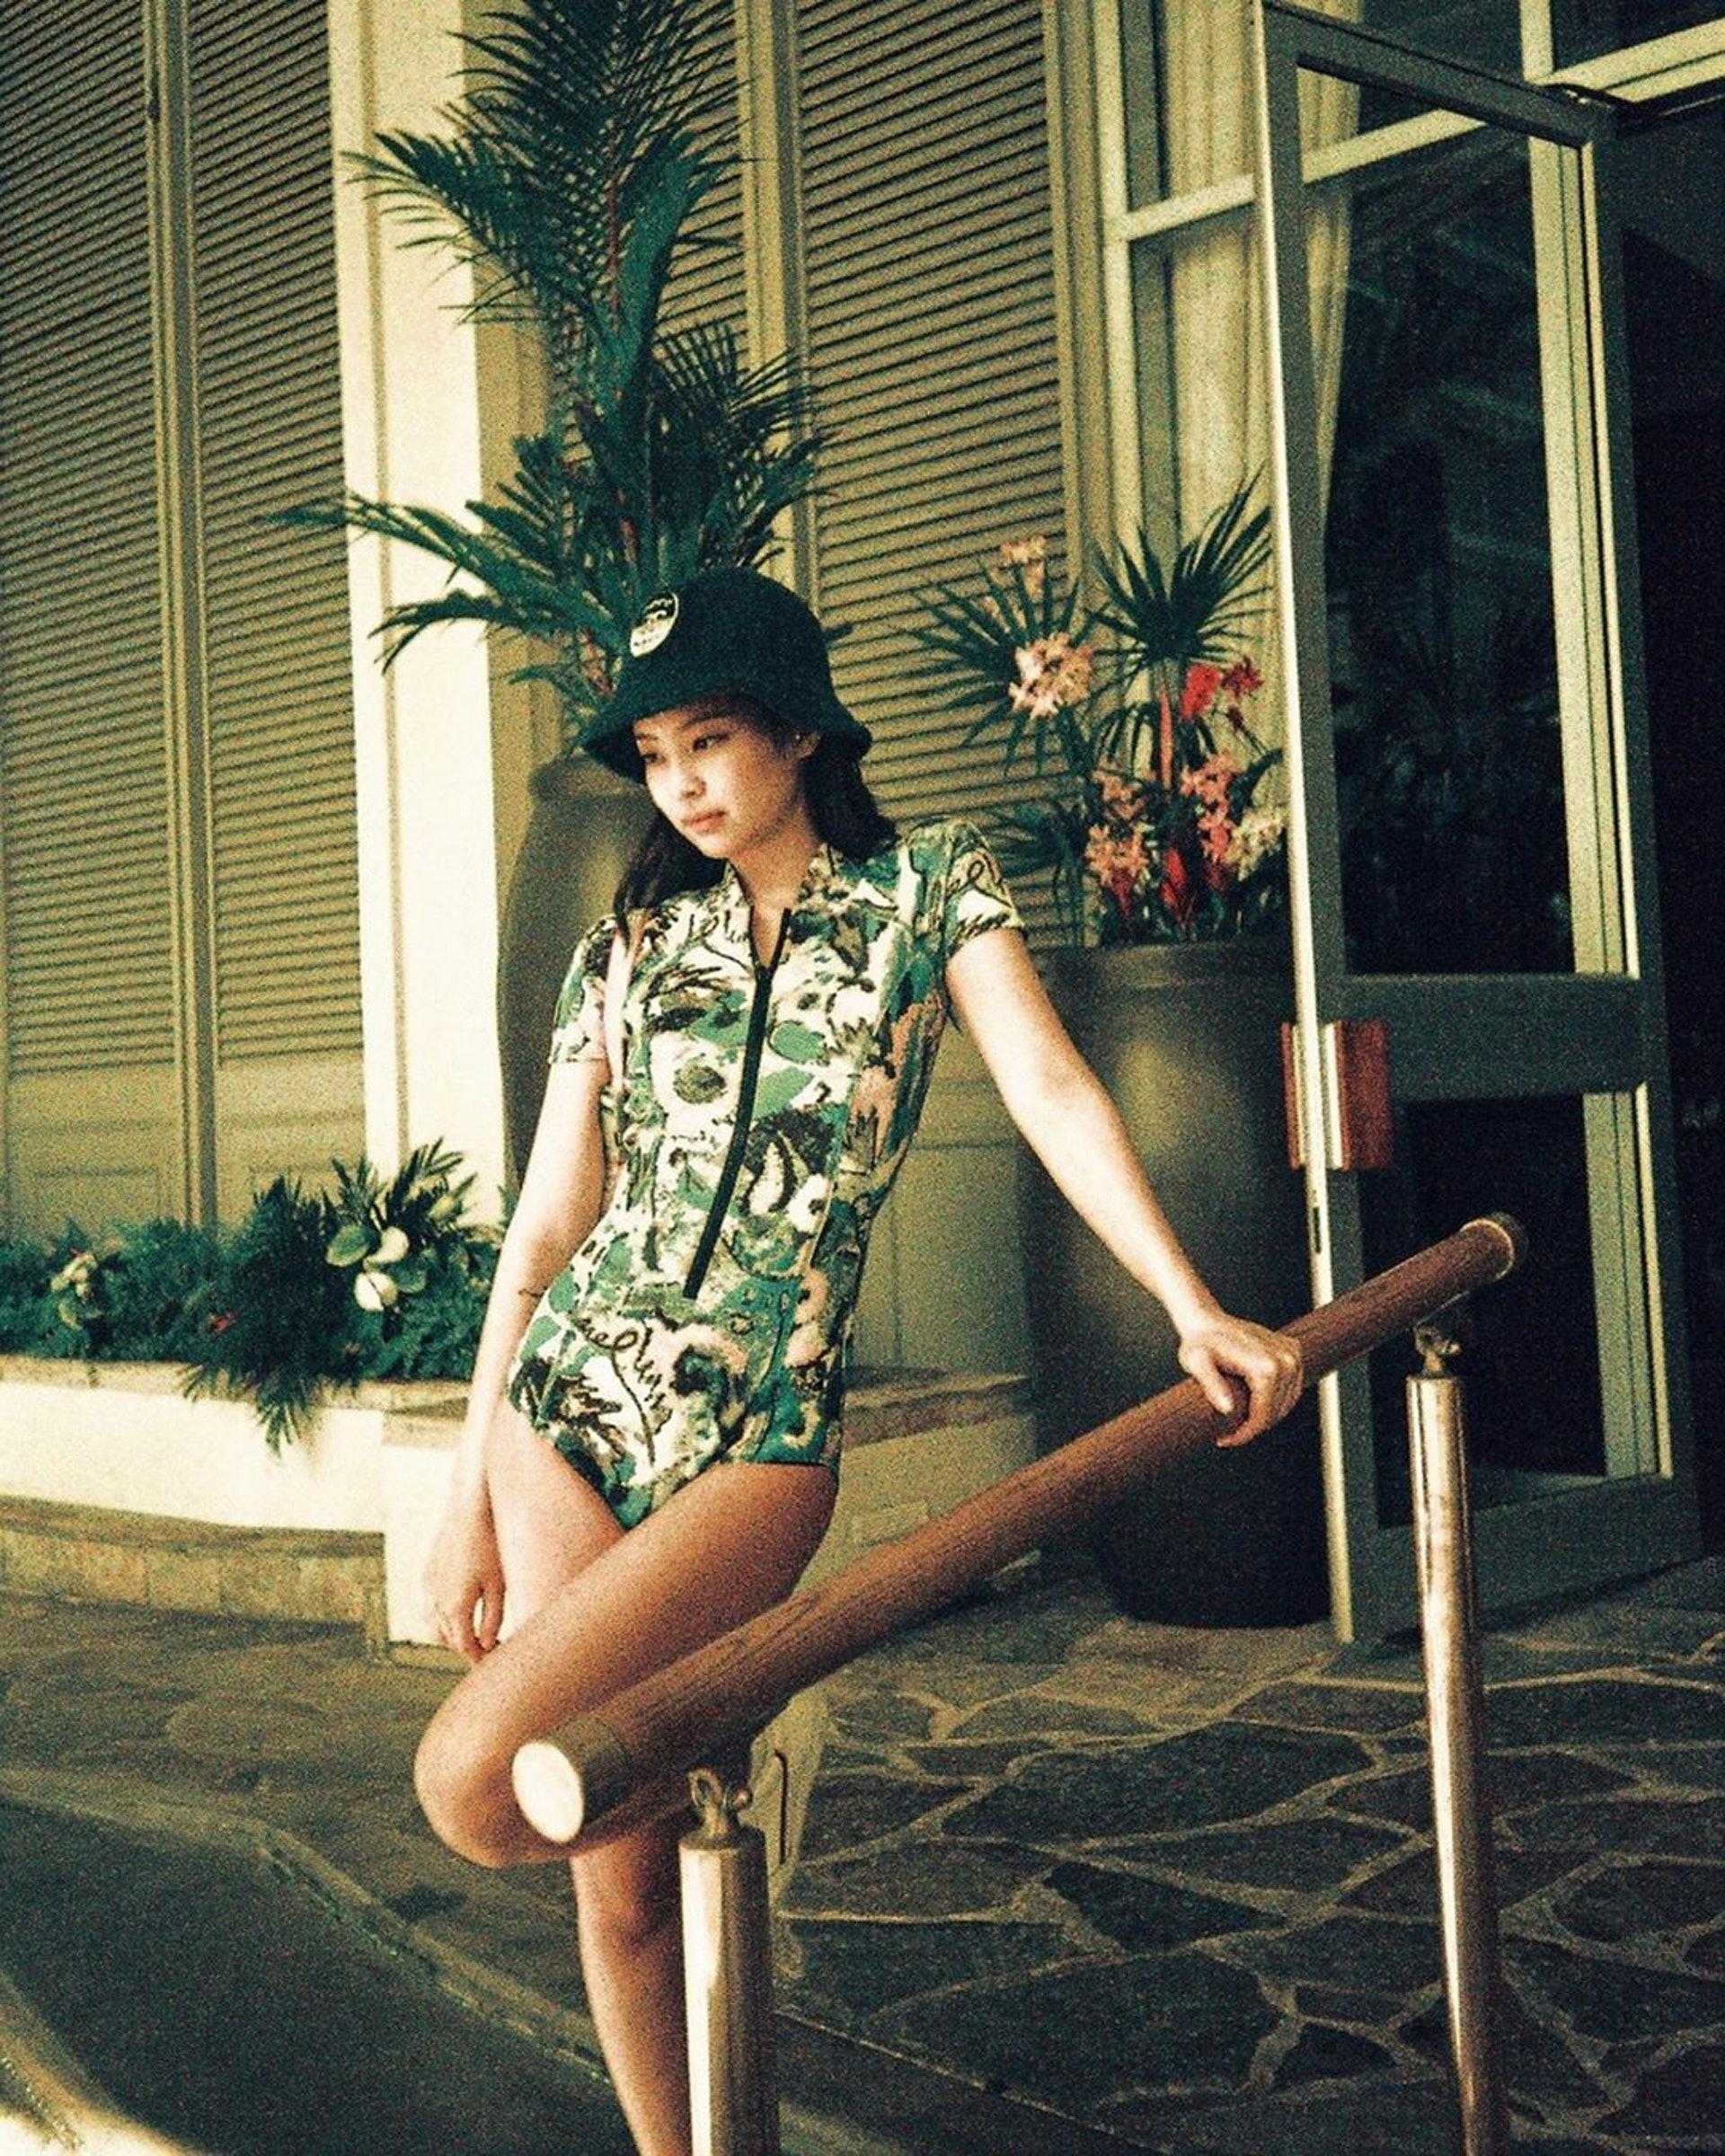 Jennie呢個Look上半身密實,但一雙長腿依然好吸睛。(IG@jennierubyjane)